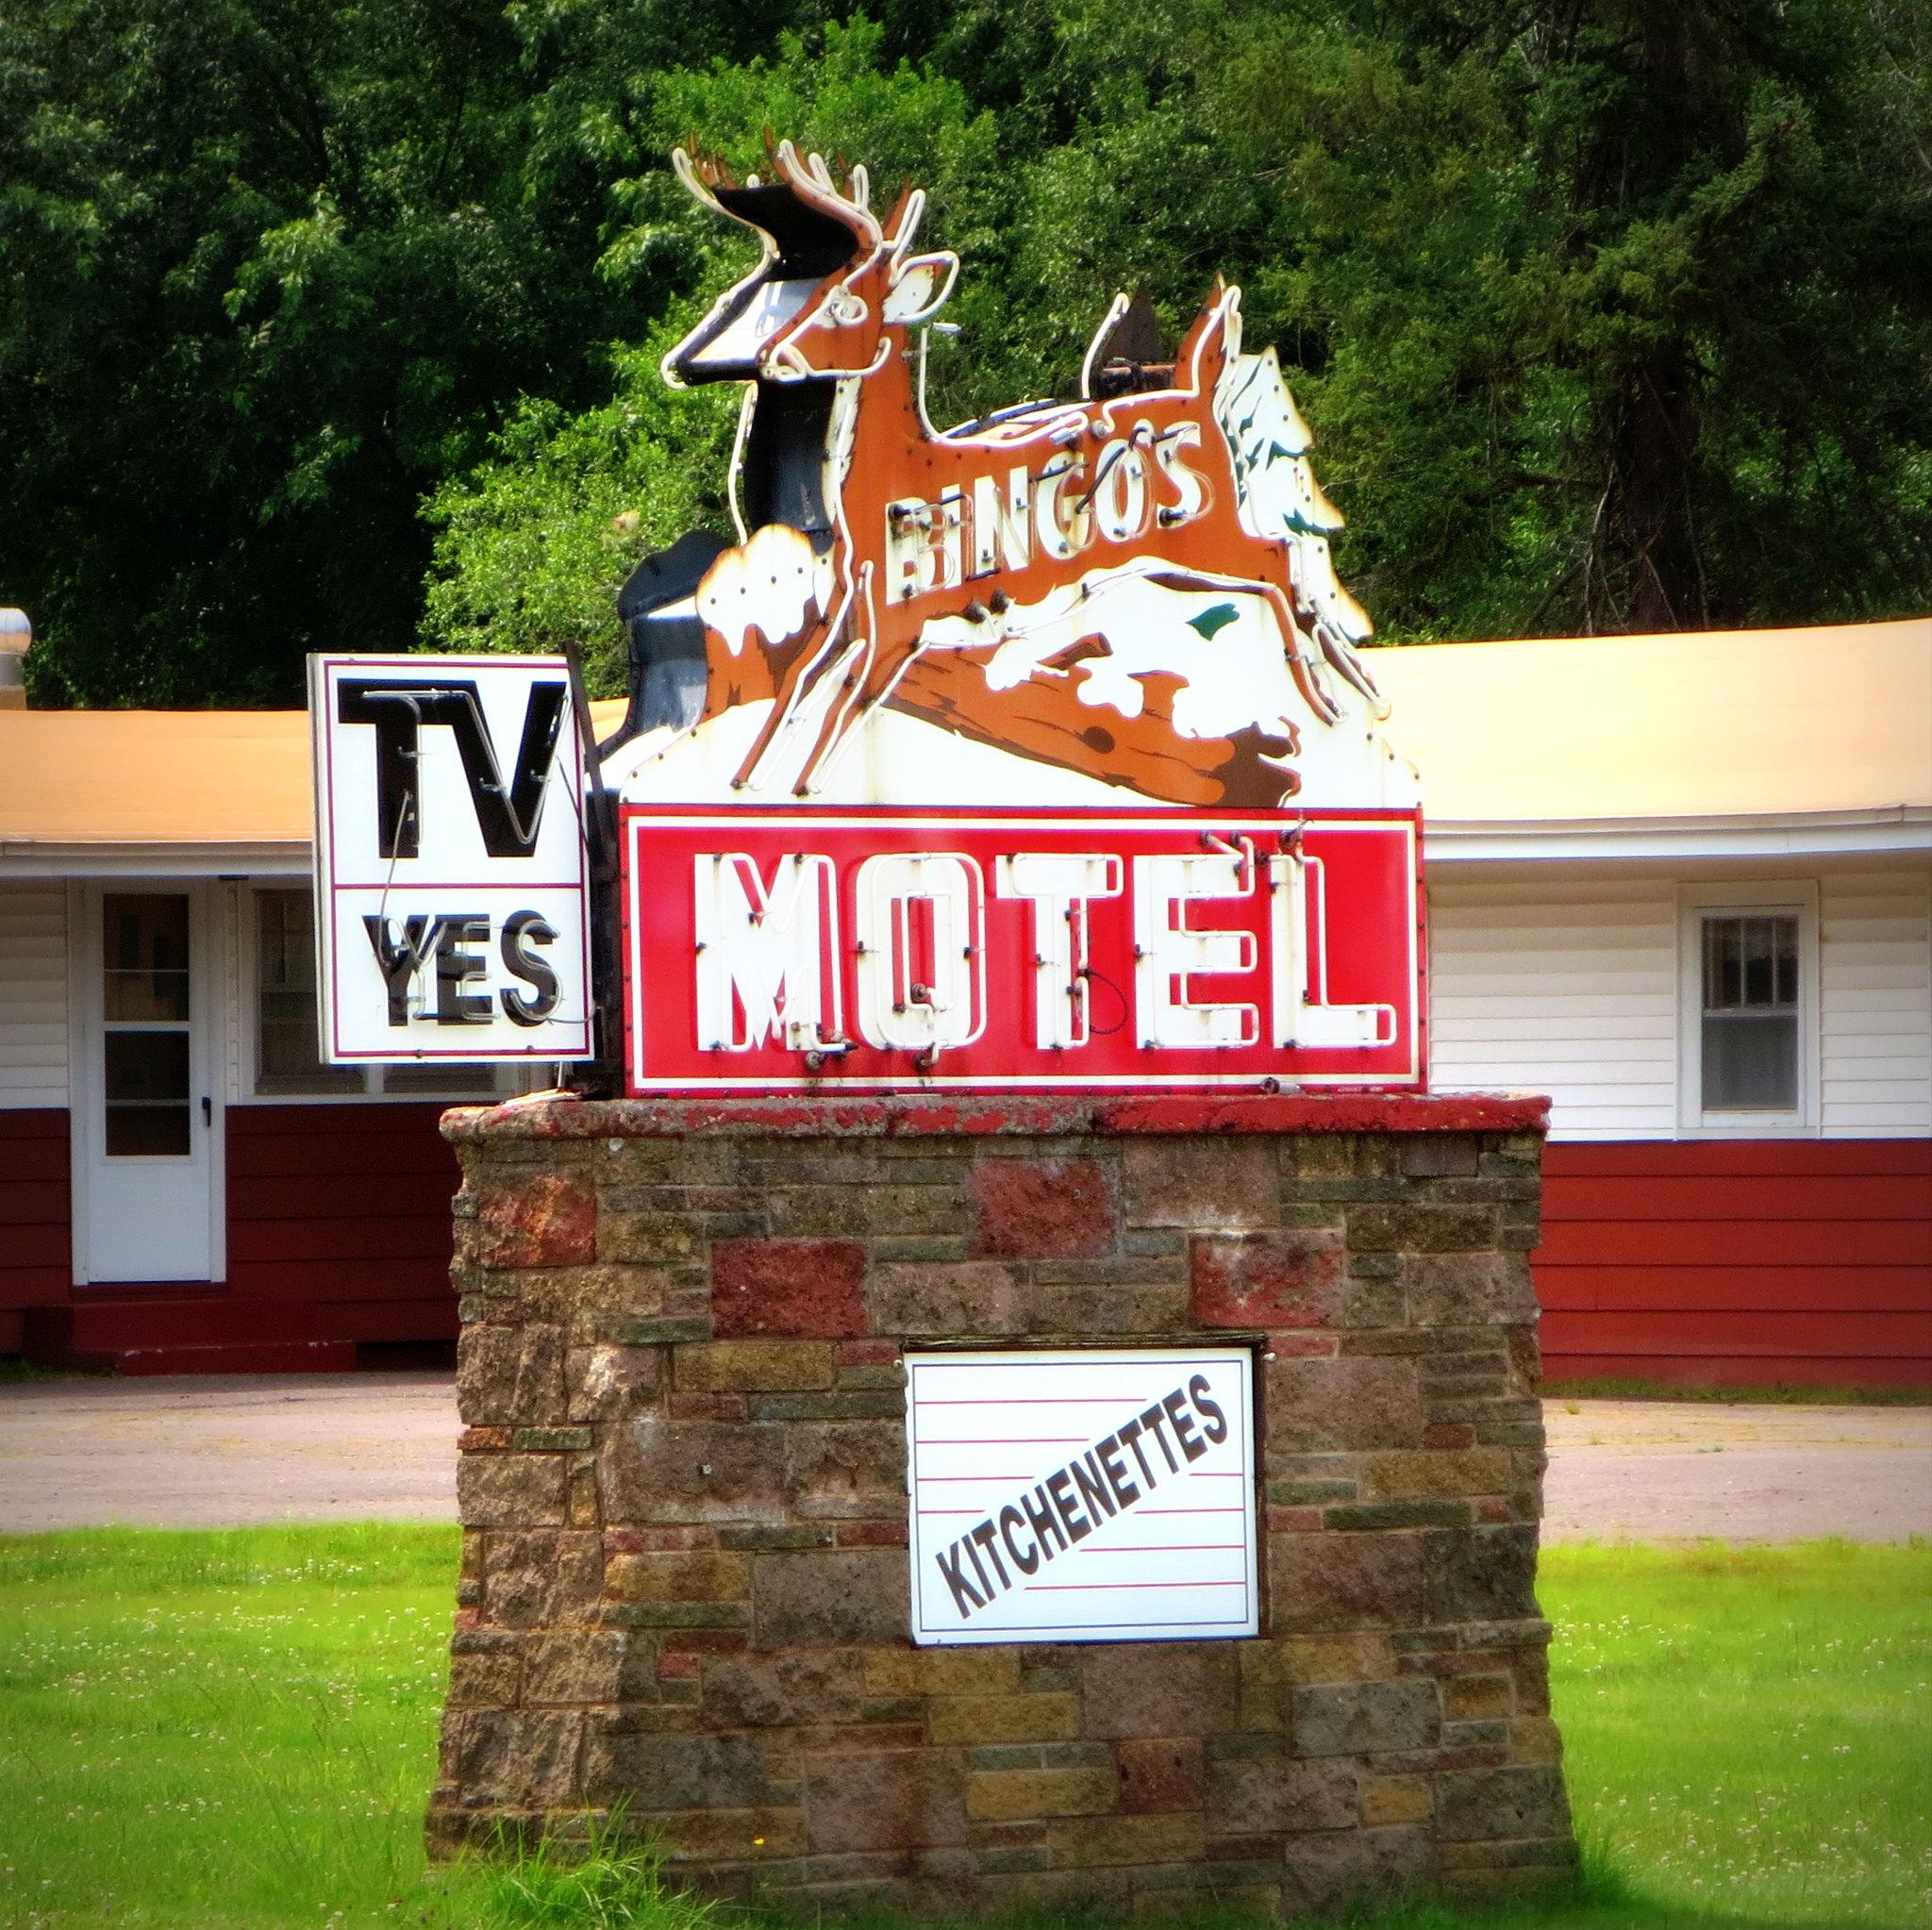 Bingo's Motel - 180 M-28, Wakefield, Michigan U.S.A. - July 18, 2014